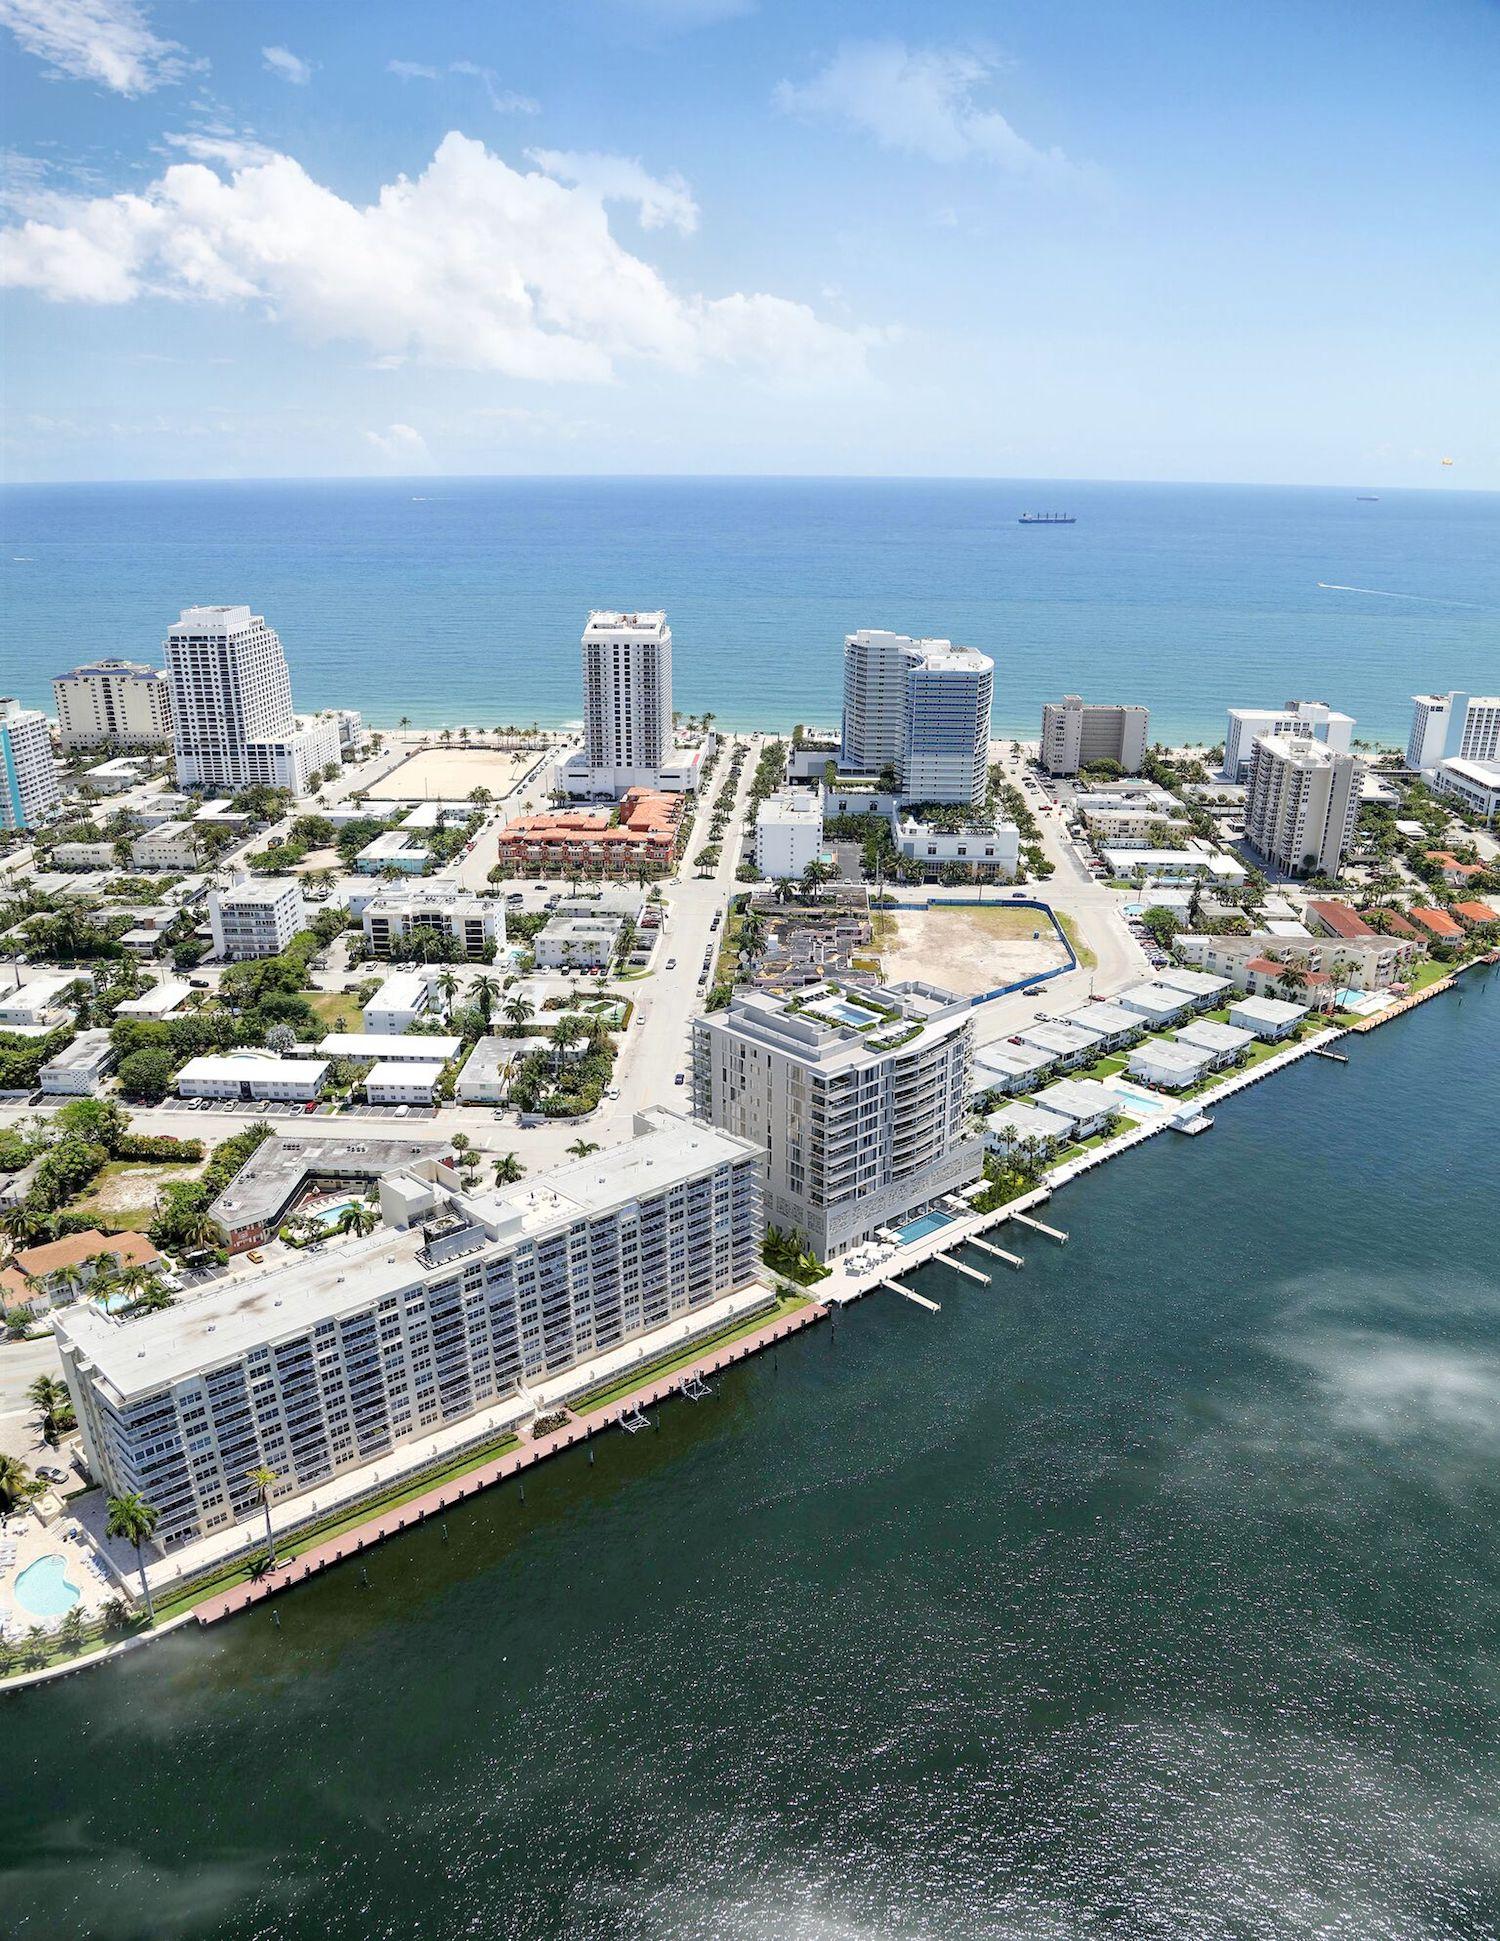 skyview image of Adagio Ft Lauderdale